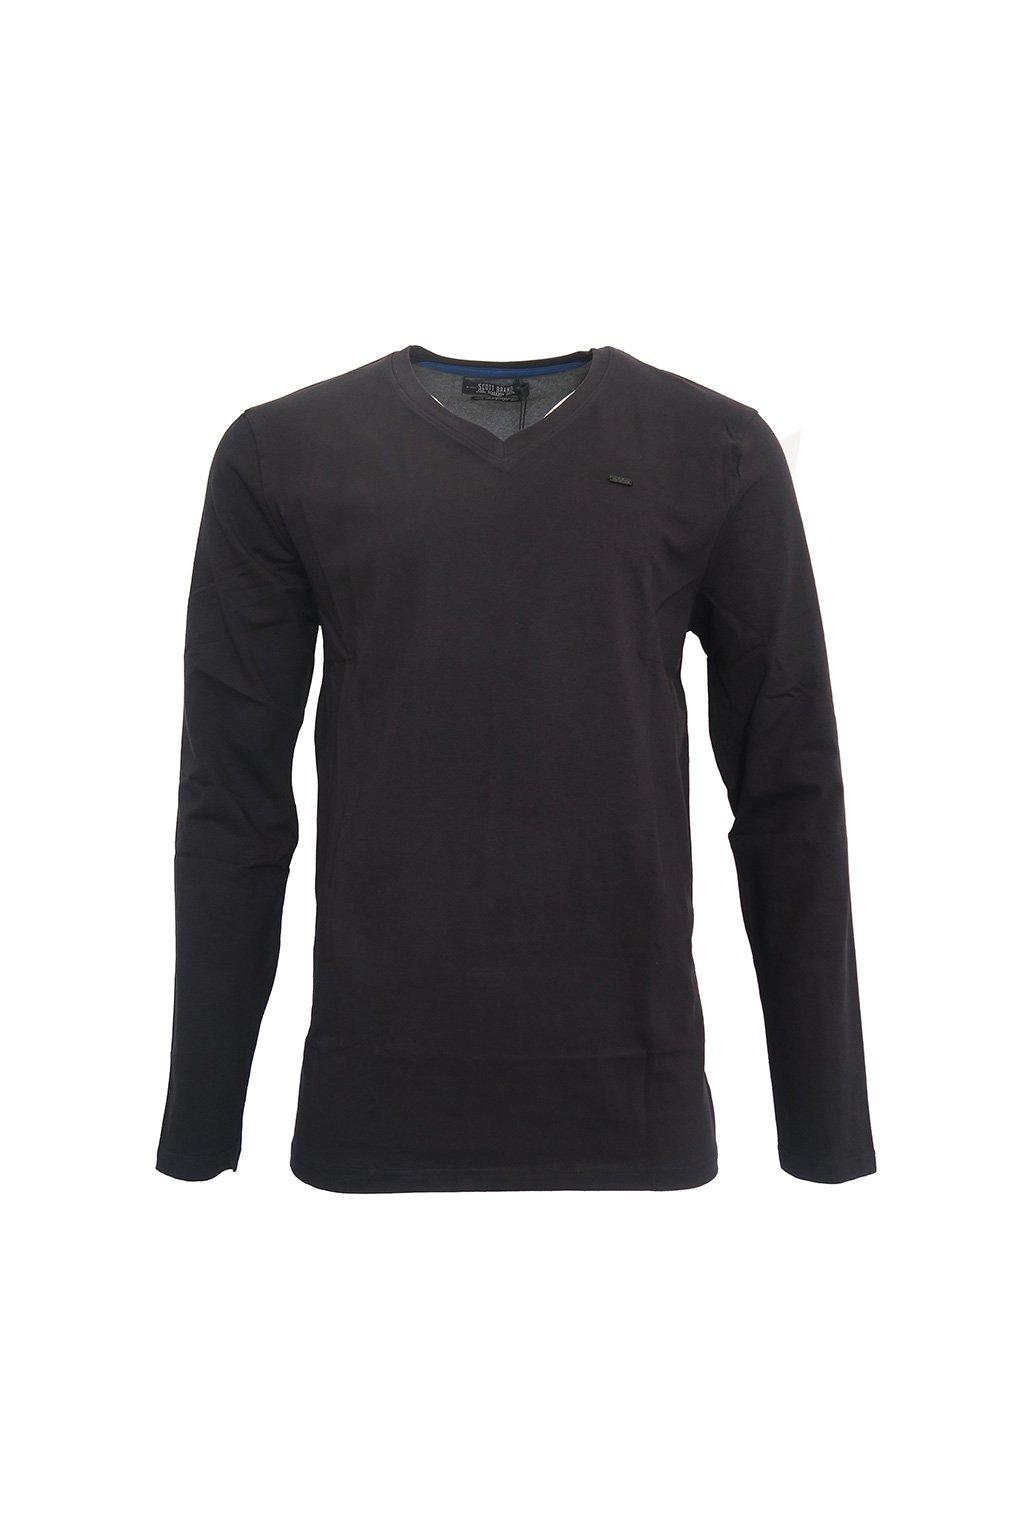 Černé triko s dlouhým rukávem Scott